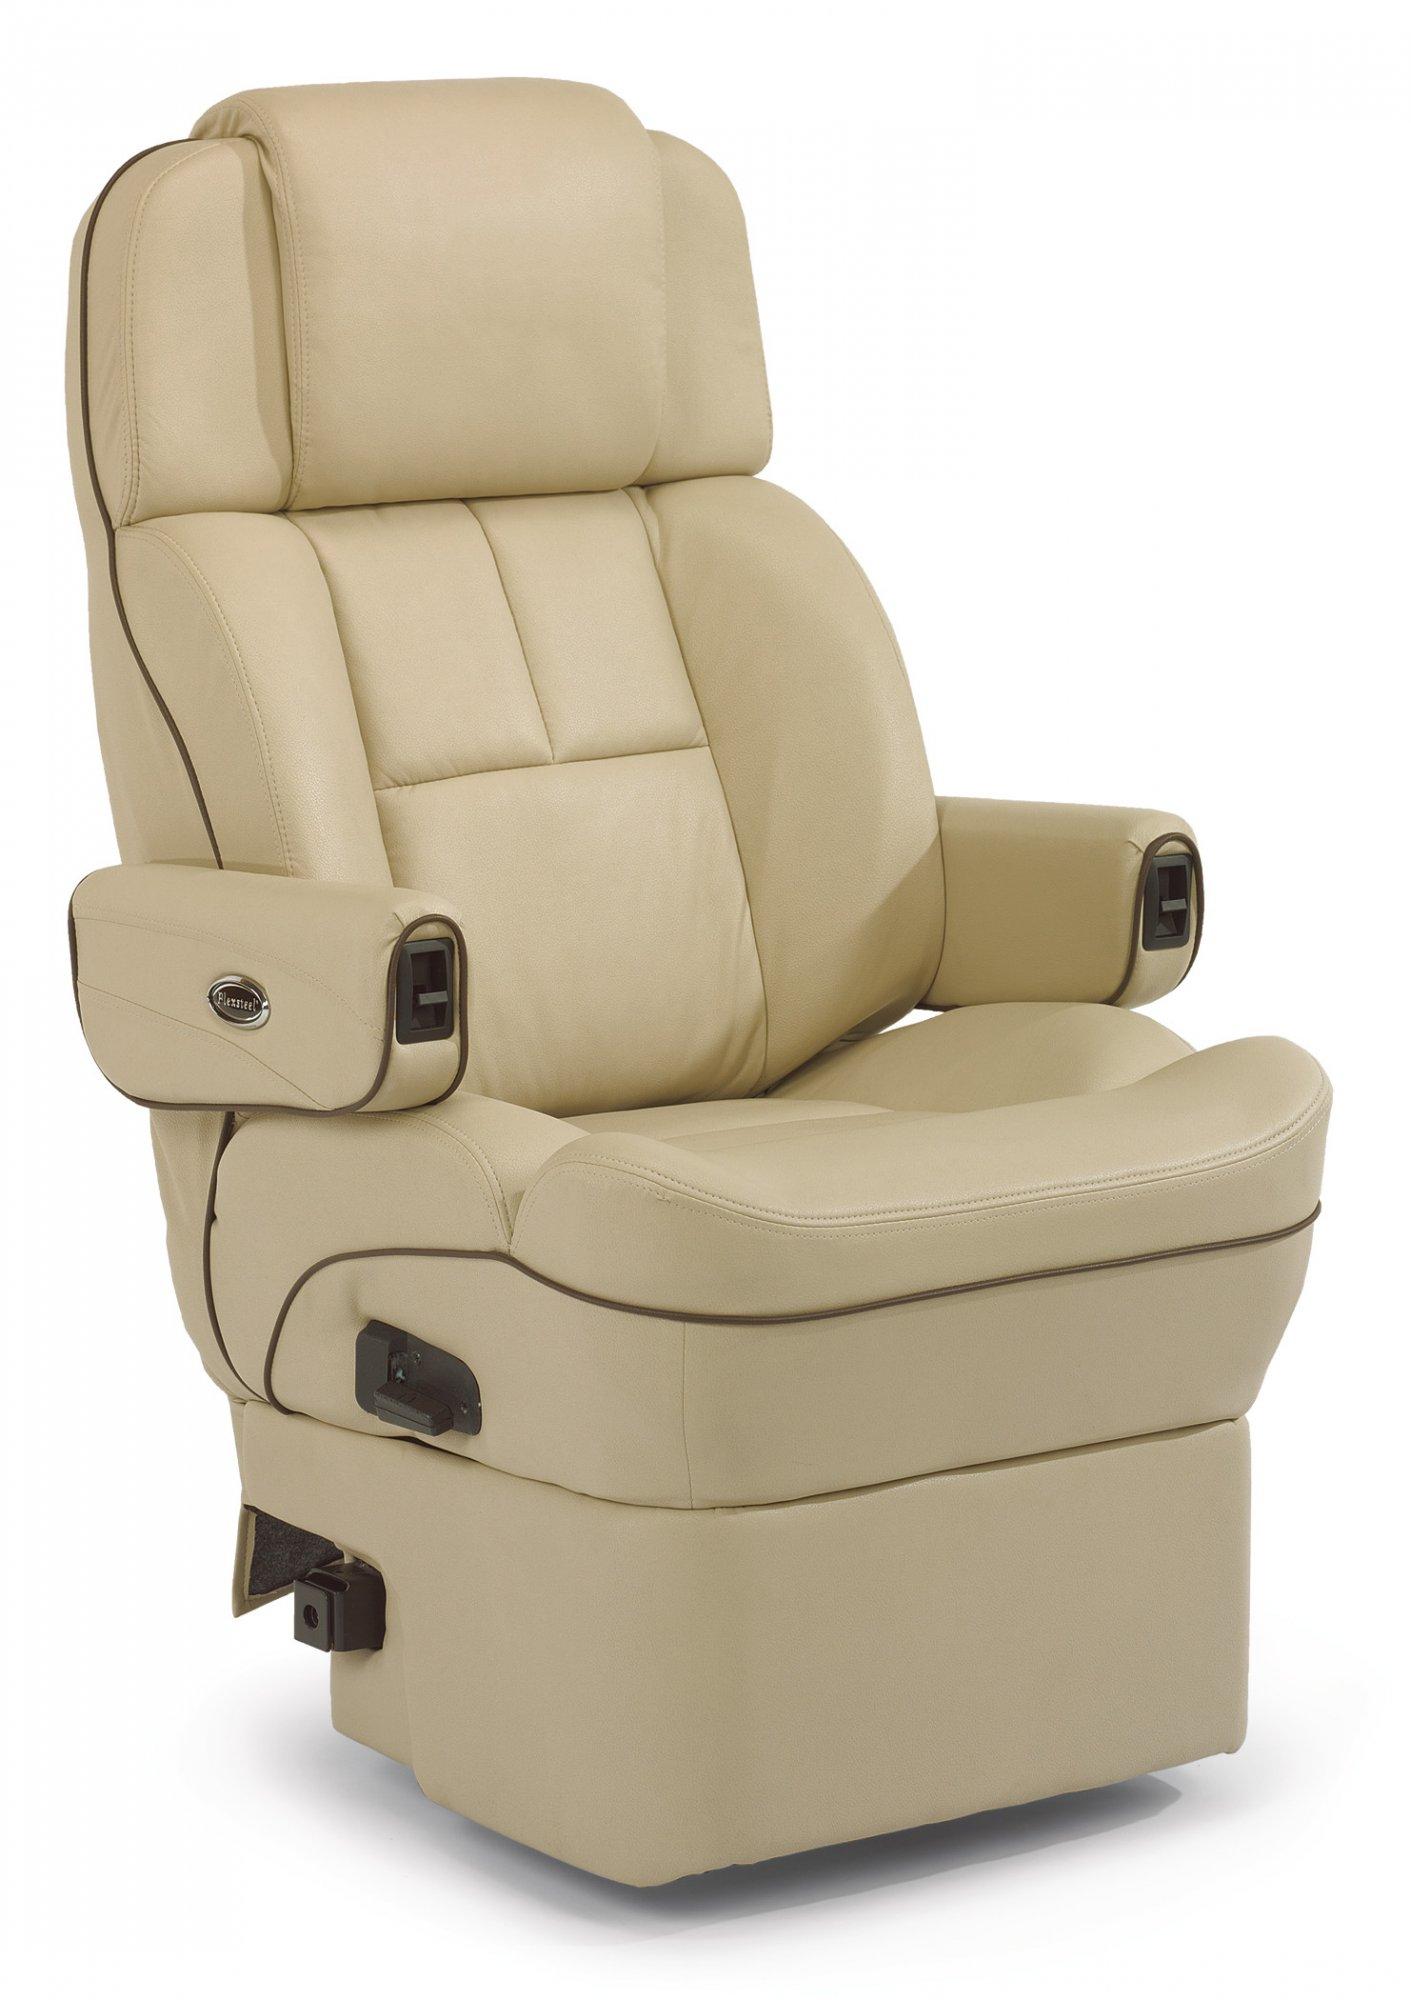 Delightful Motor Home Bucket Seat Class A